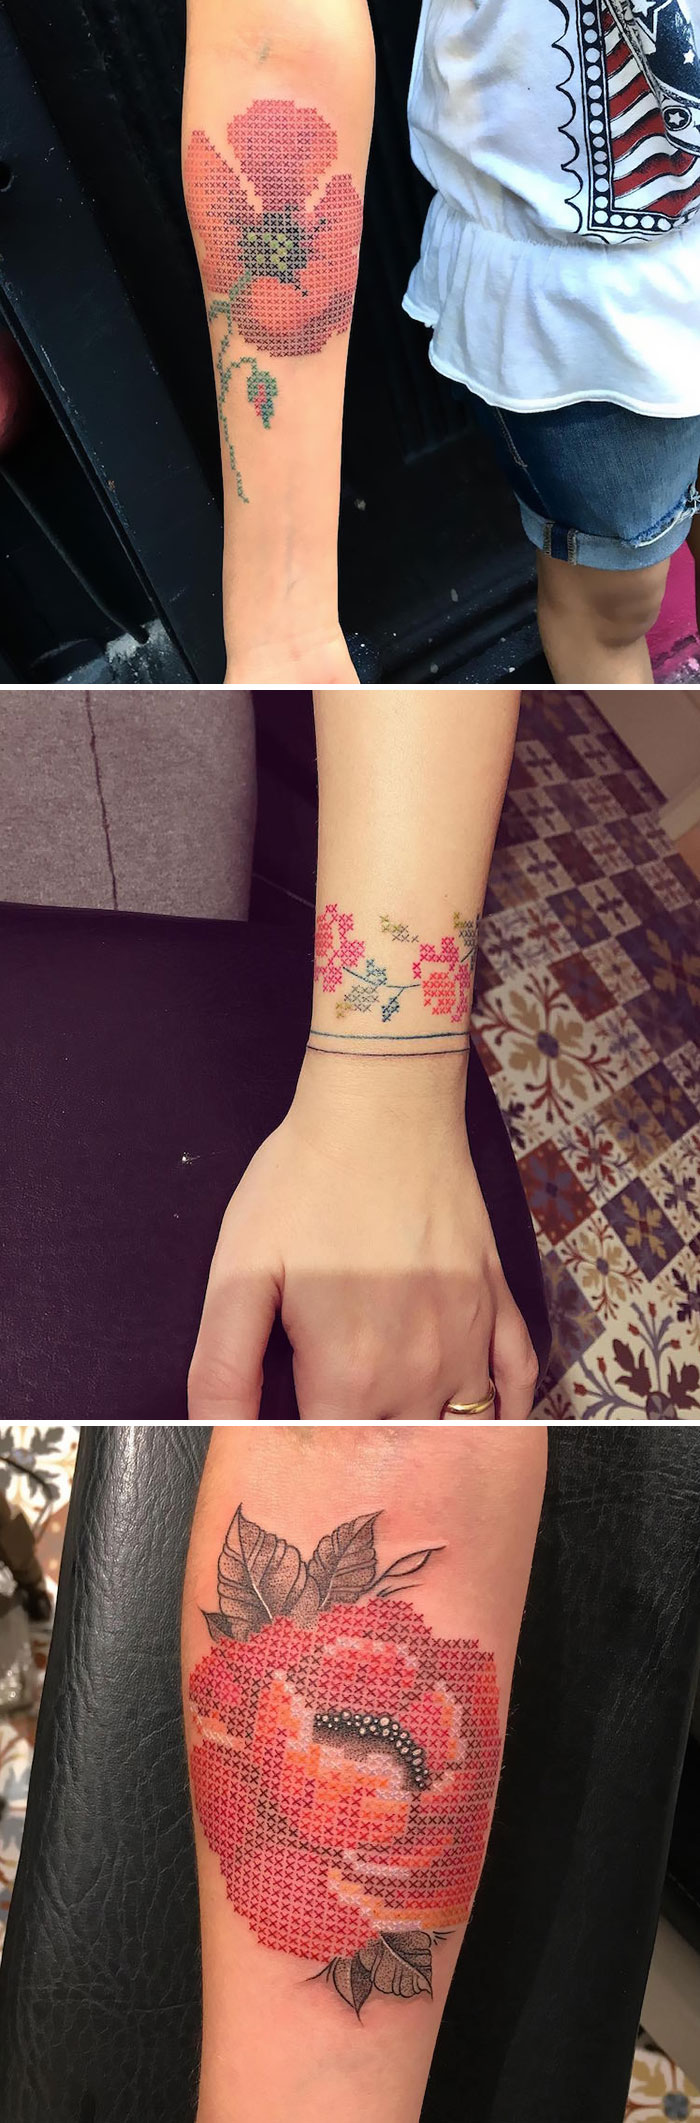 tatuagens-florais (7)